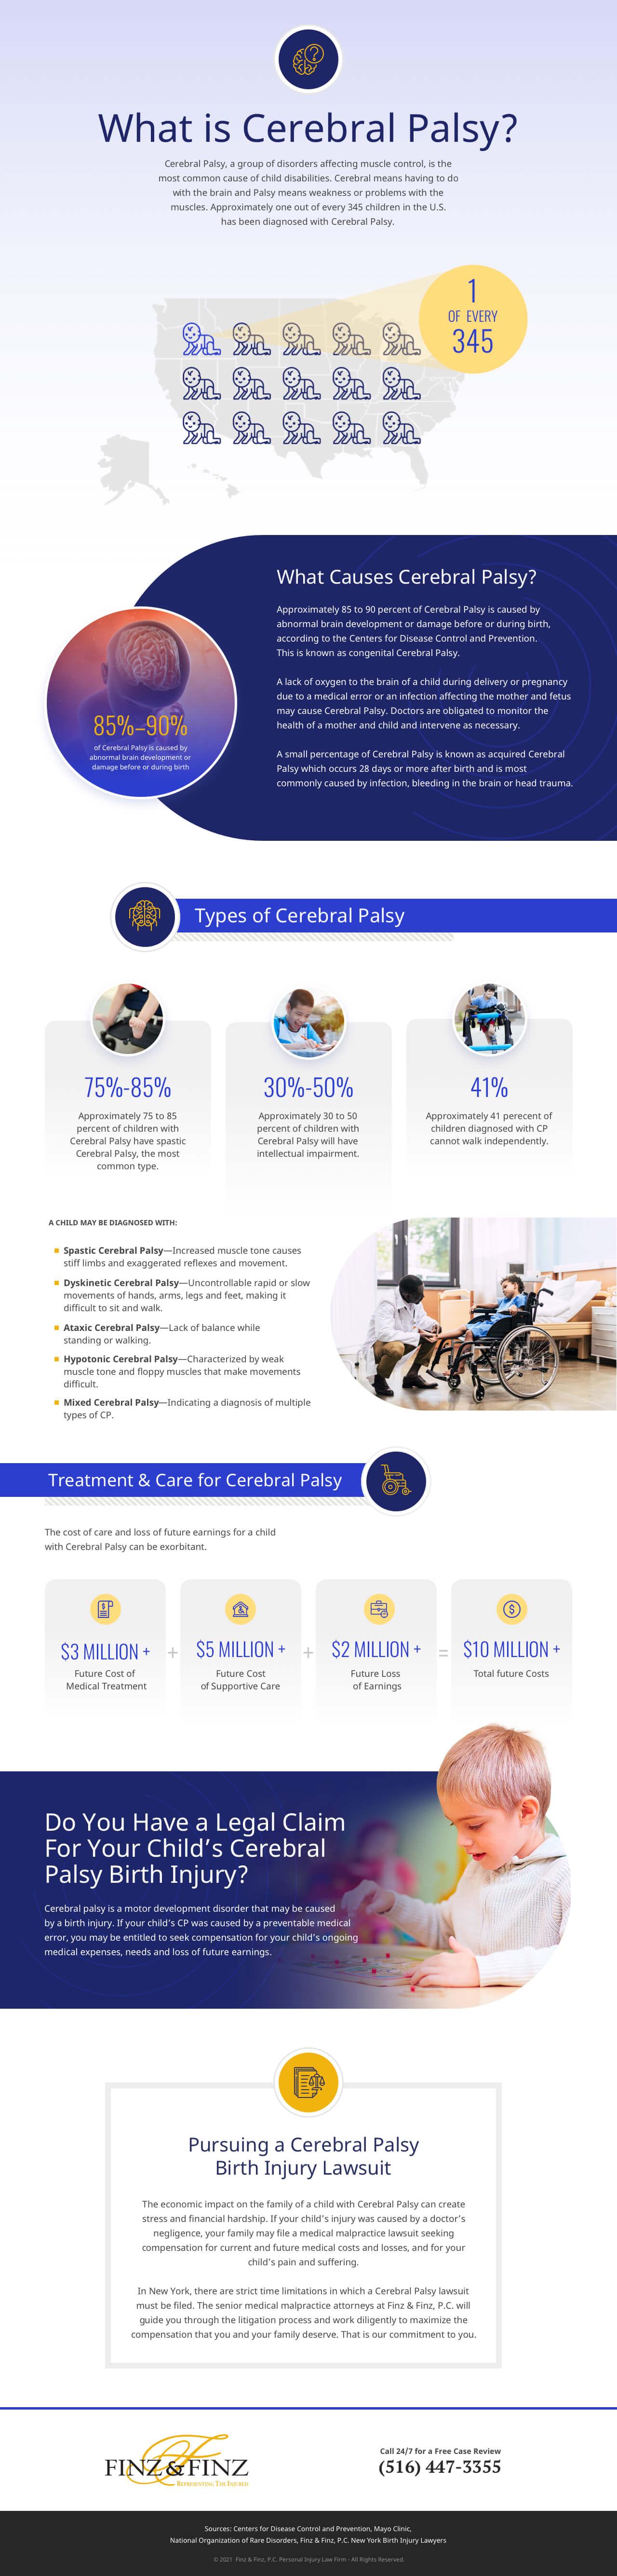 Cerebral Palsy Birth Injury Infographic - Finz & Finz